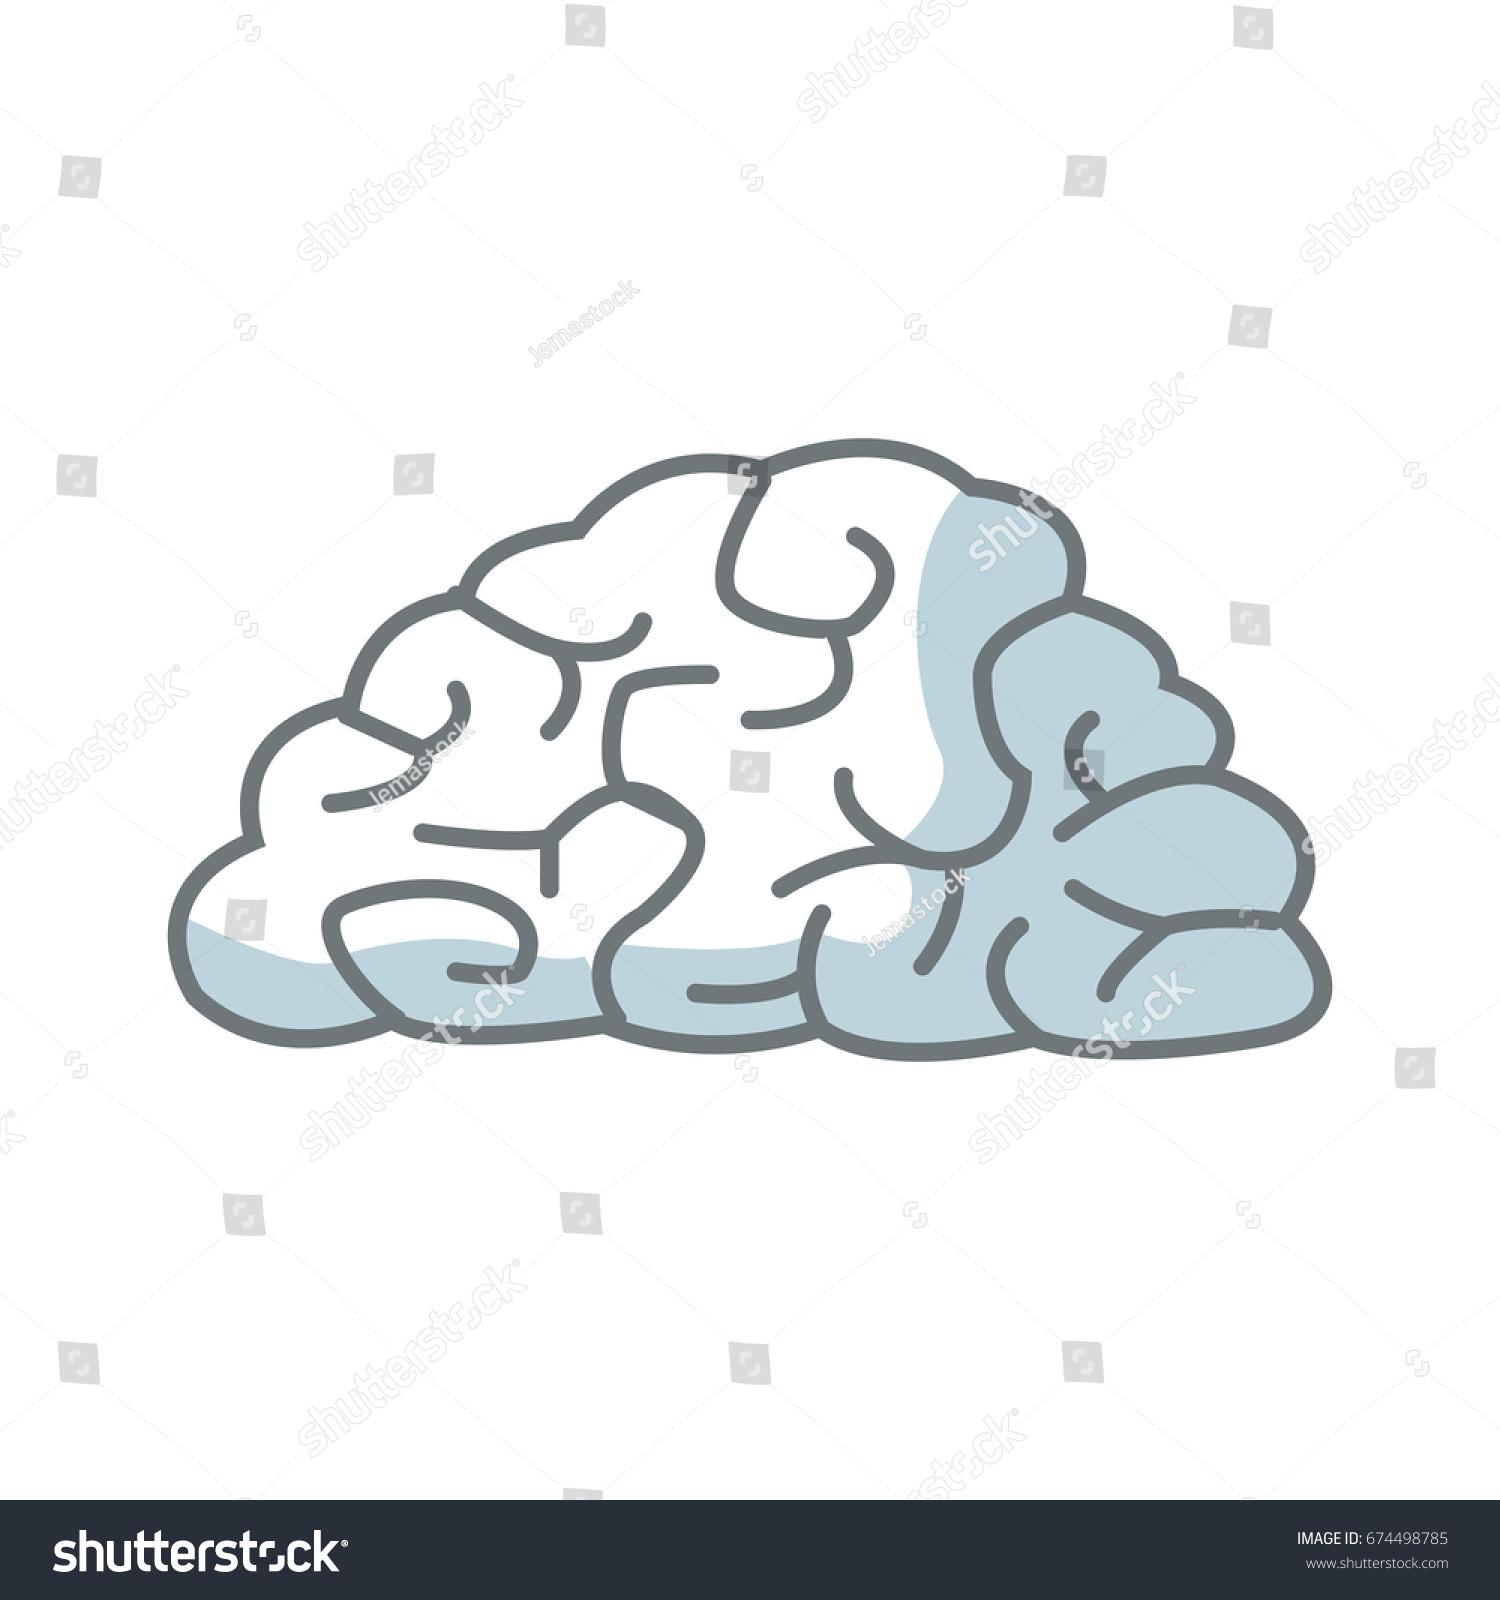 Human Brain Organ Health Memory Anatomy Stock Vector 674498785 ...